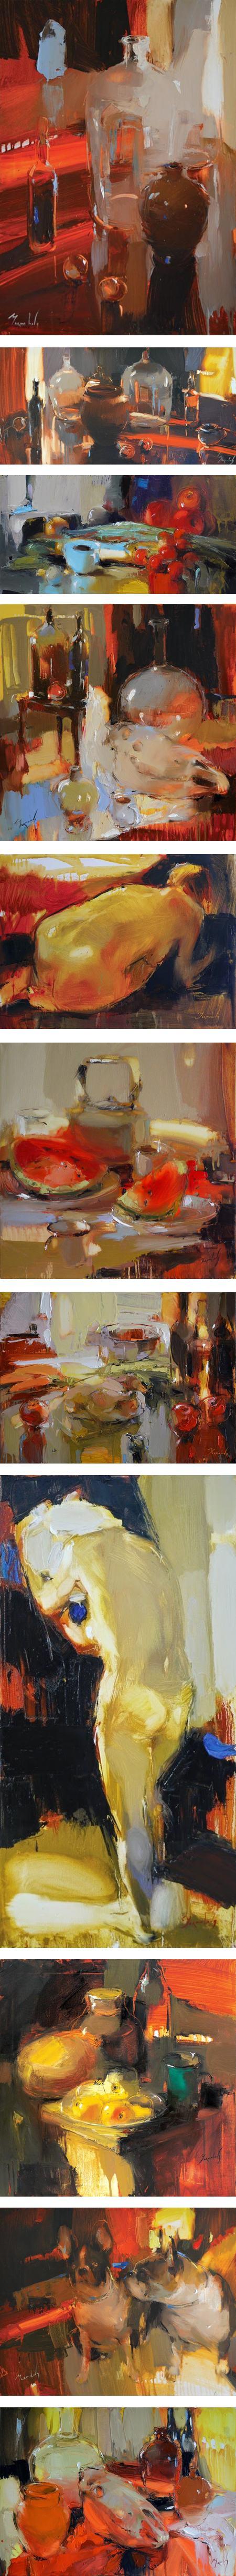 Iryna Yermolova, still life and figures